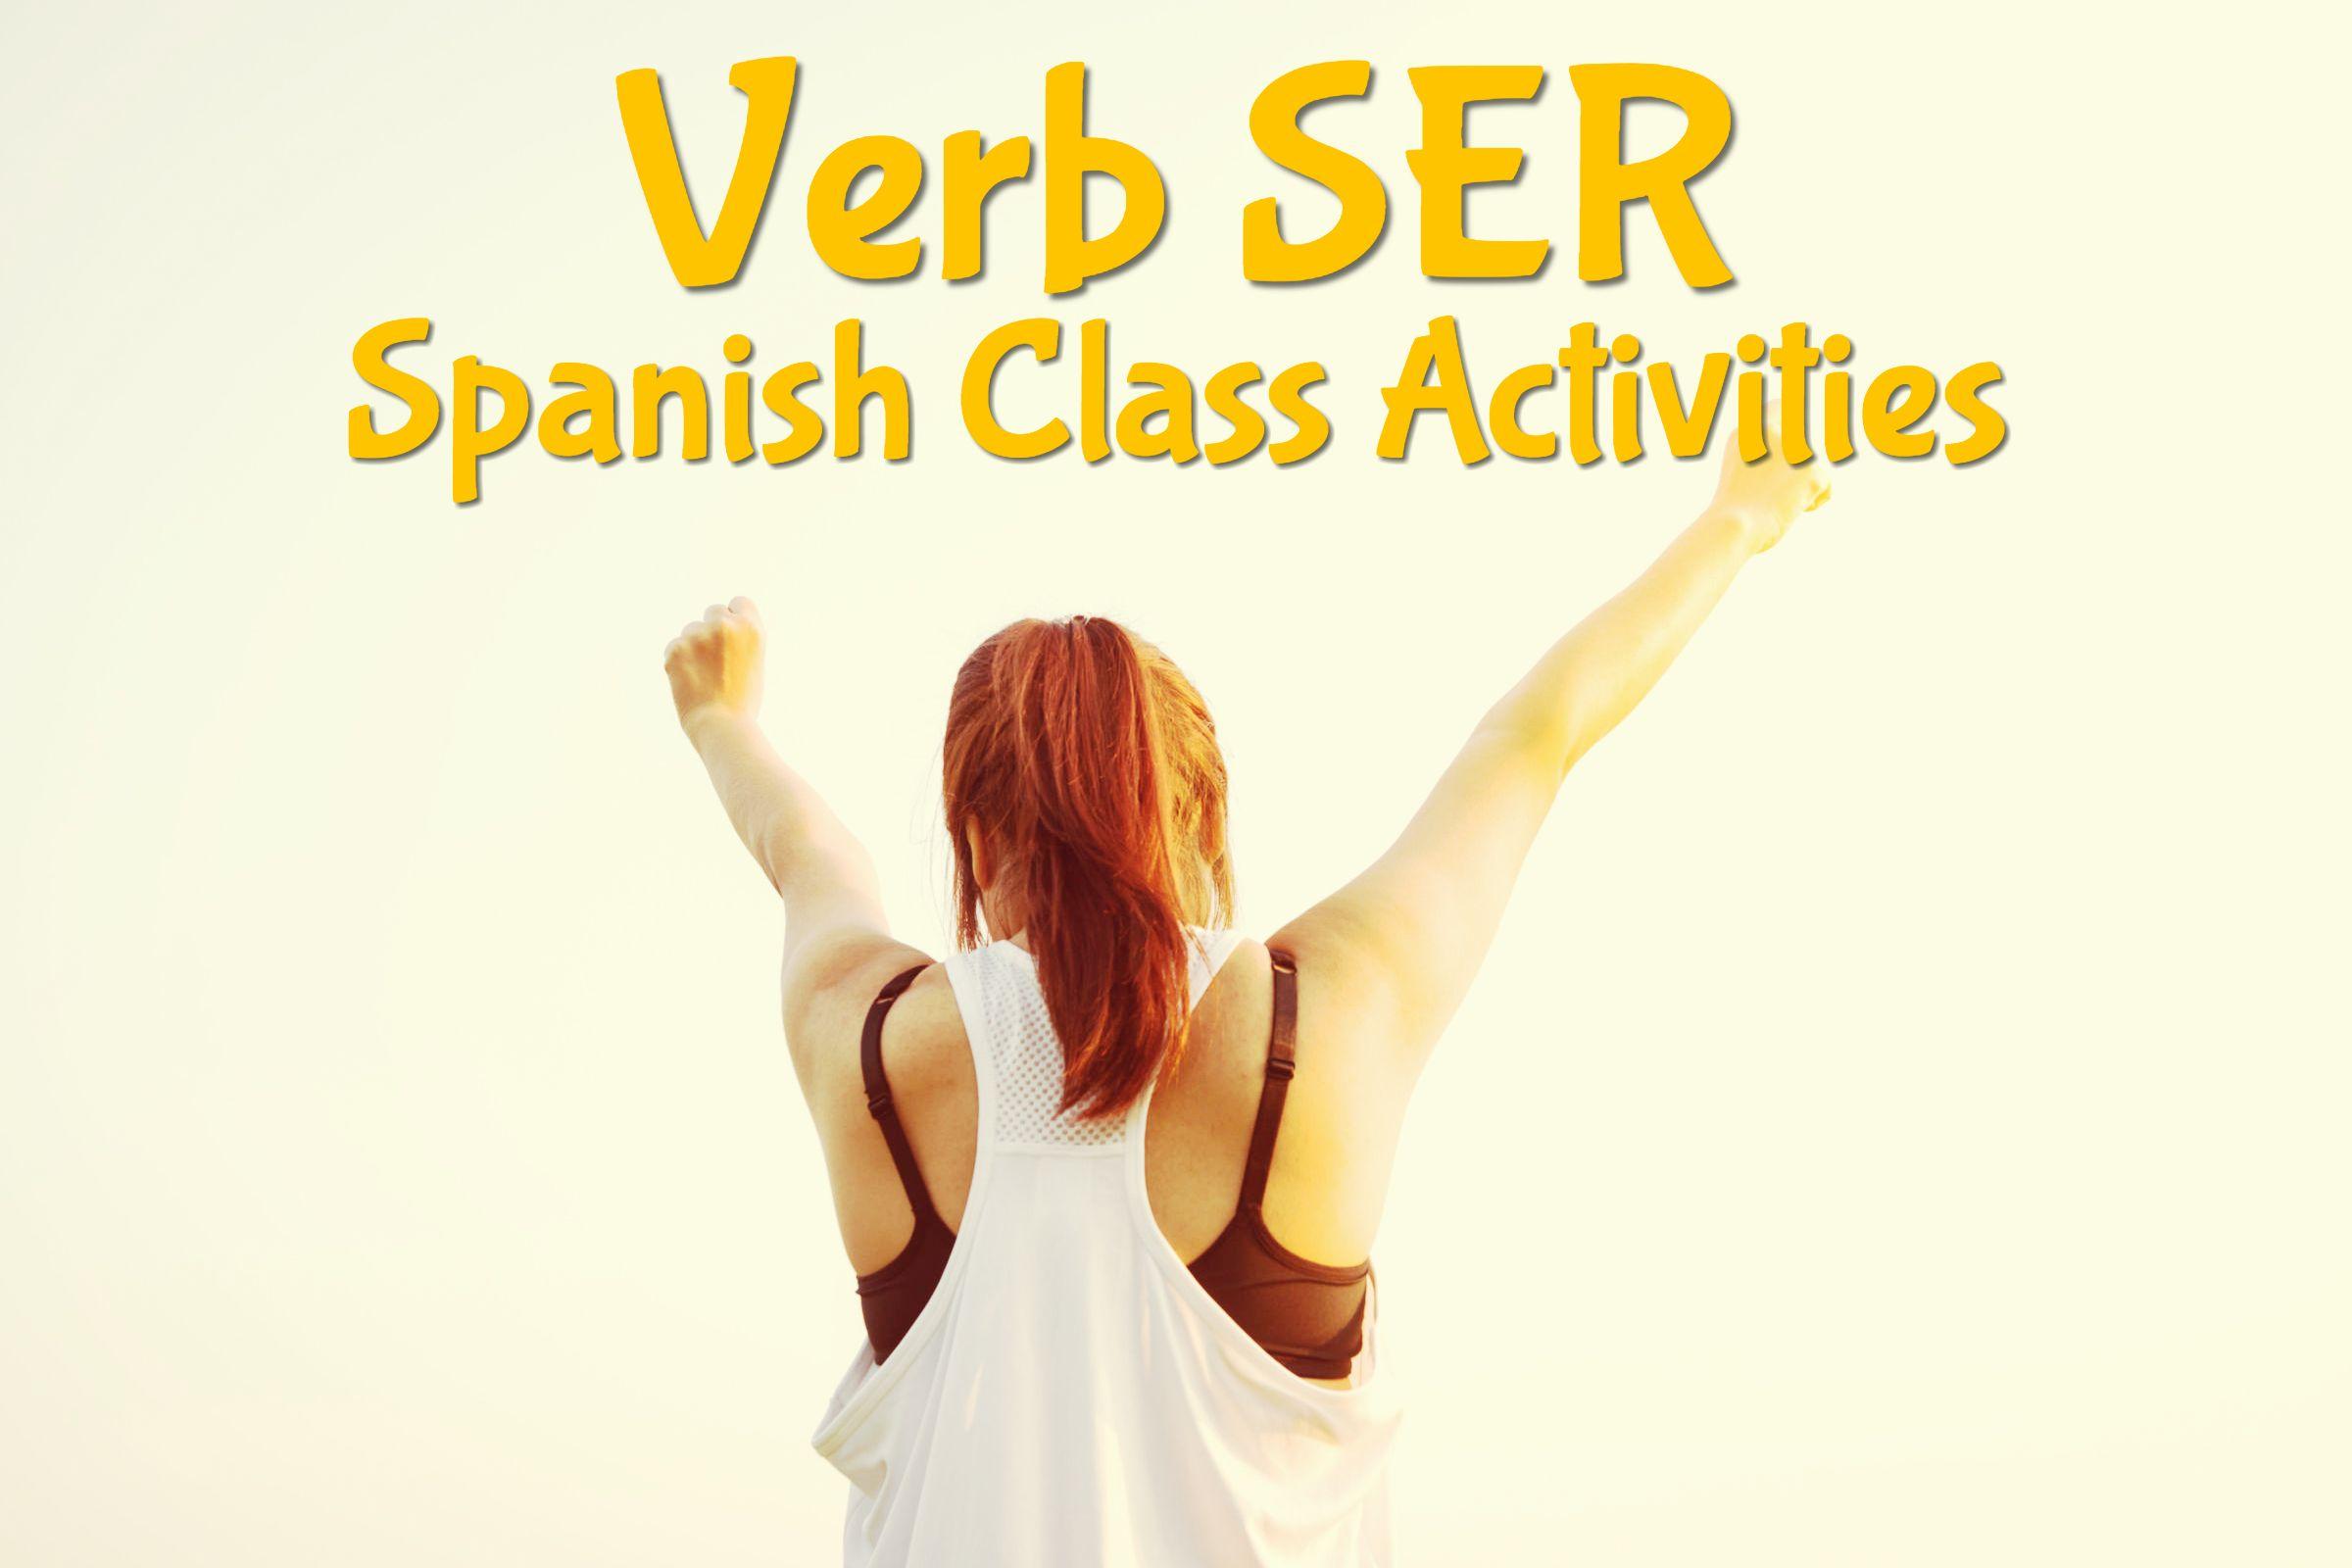 Verb Ser Spanish Class Activities